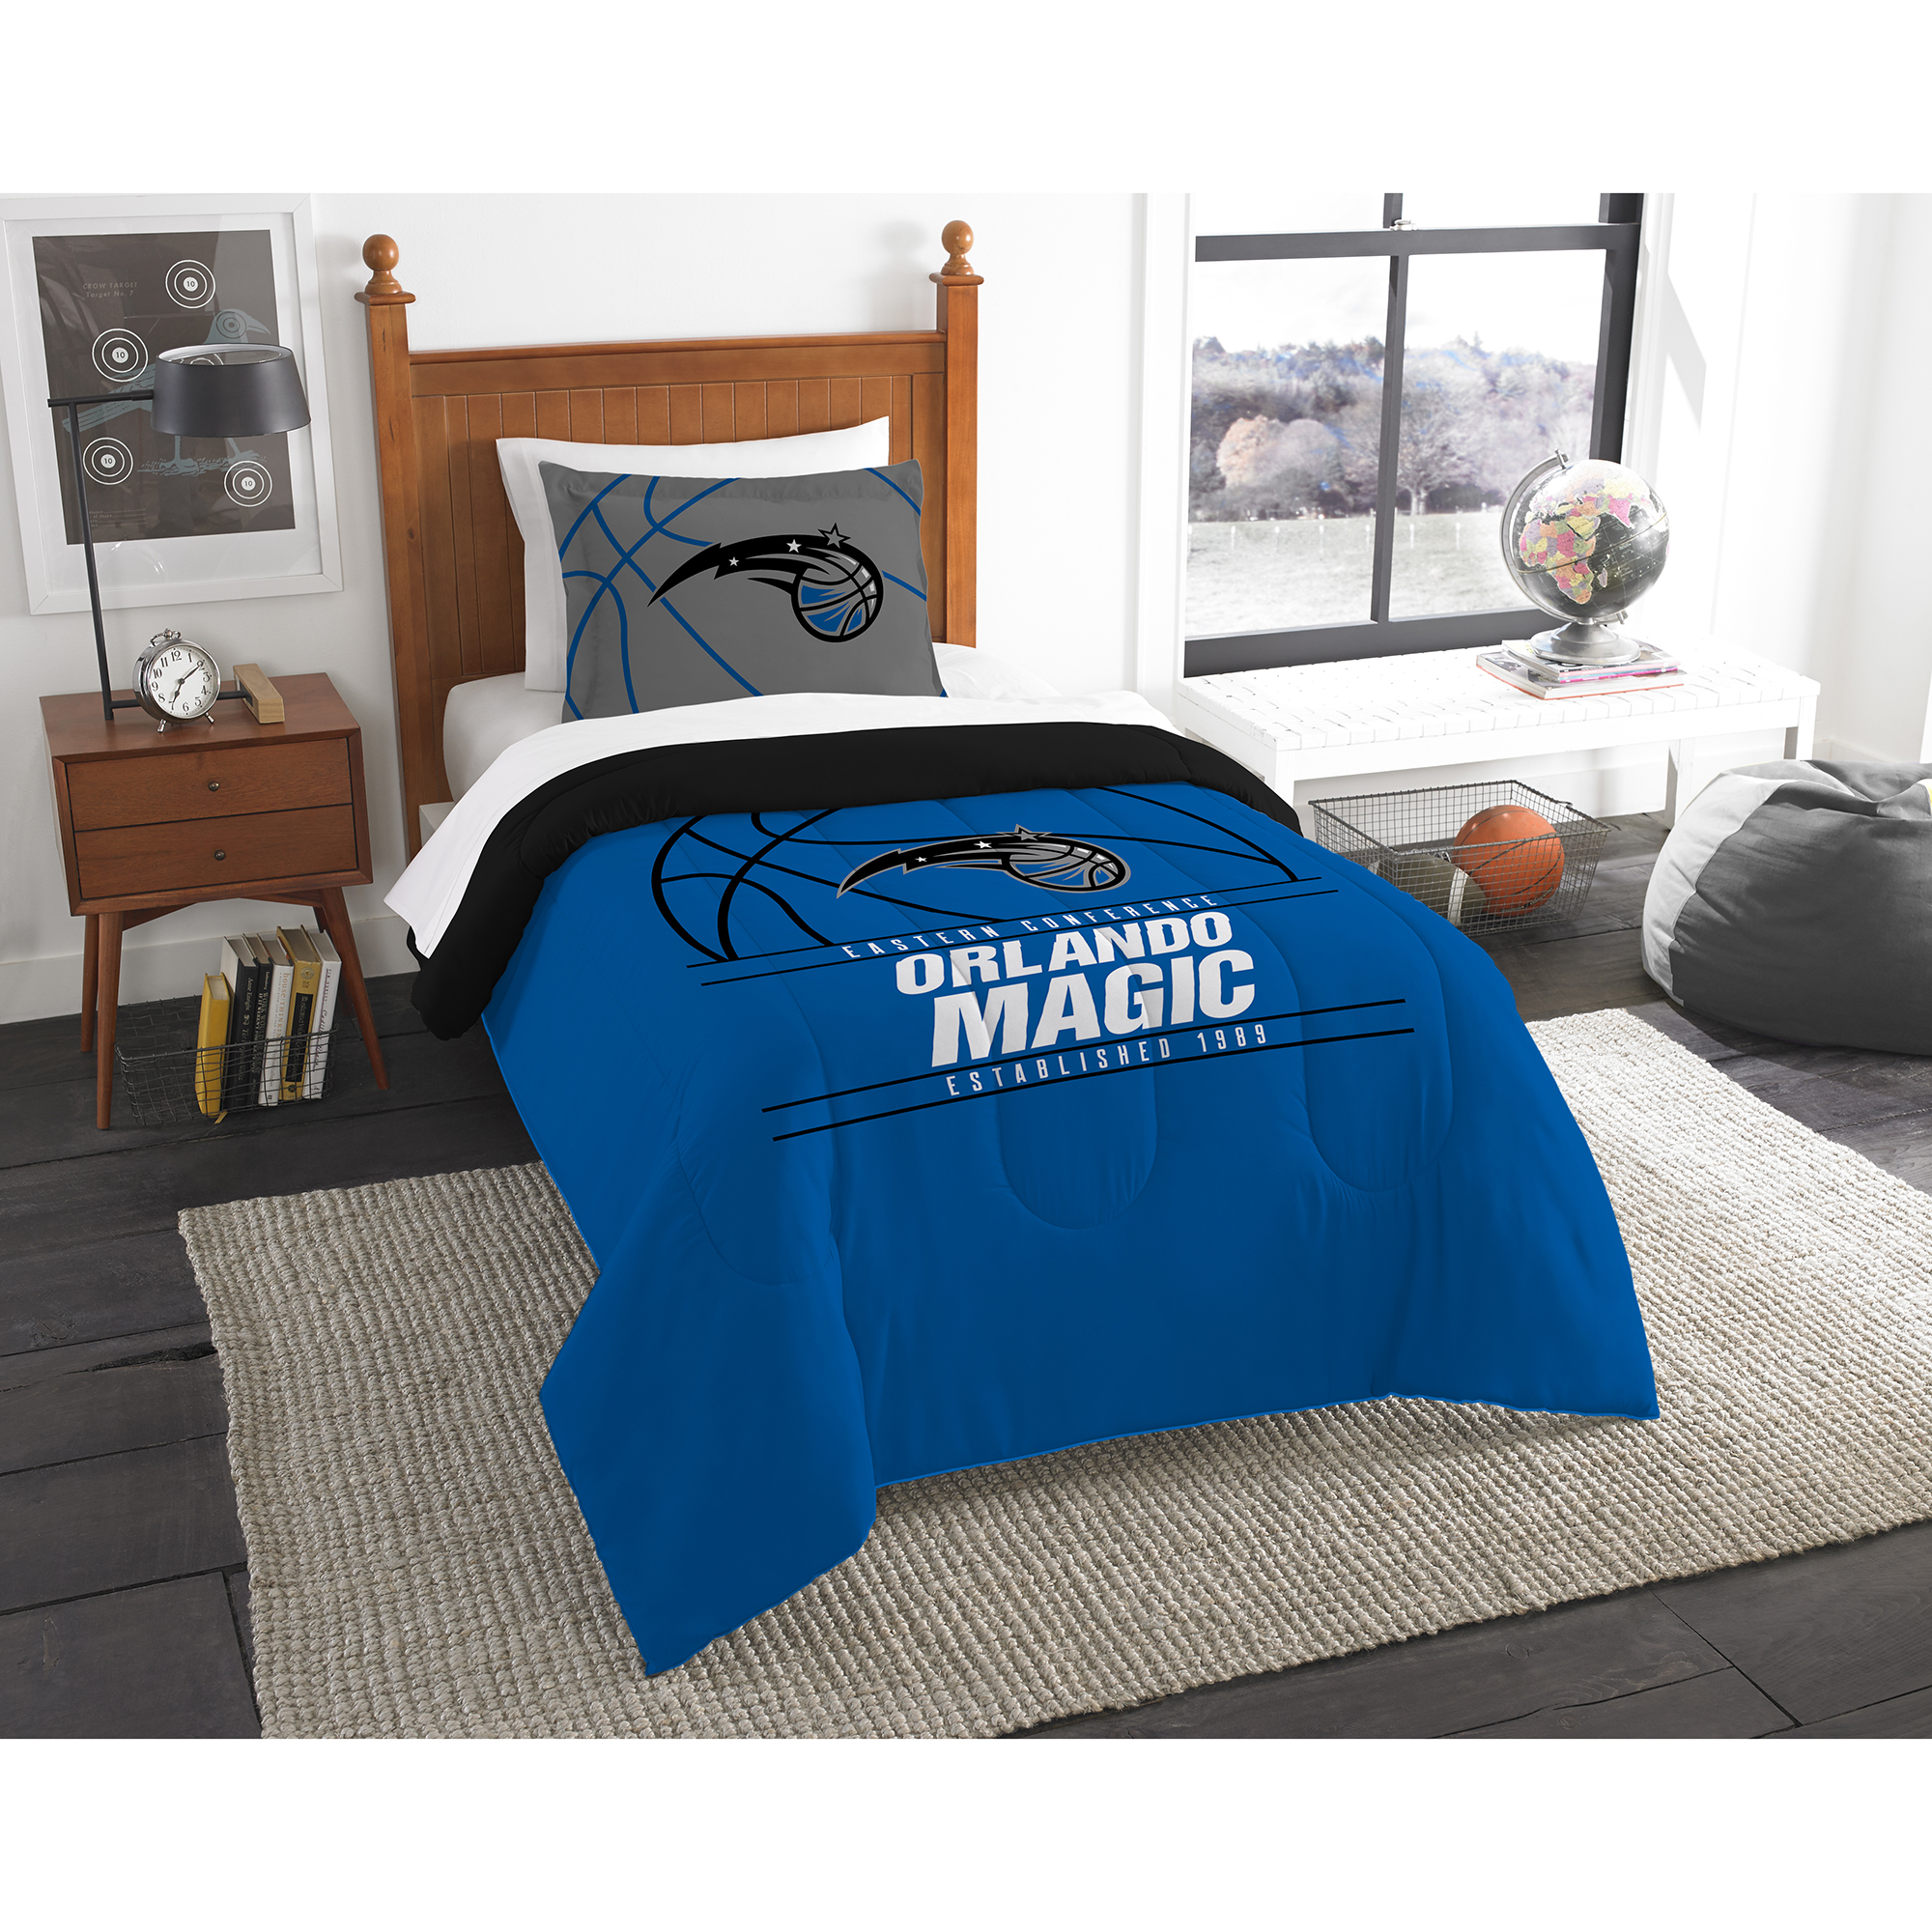 Orlando Magic The Northwest Company Reverse Slam Twin Comforter Set - No Size